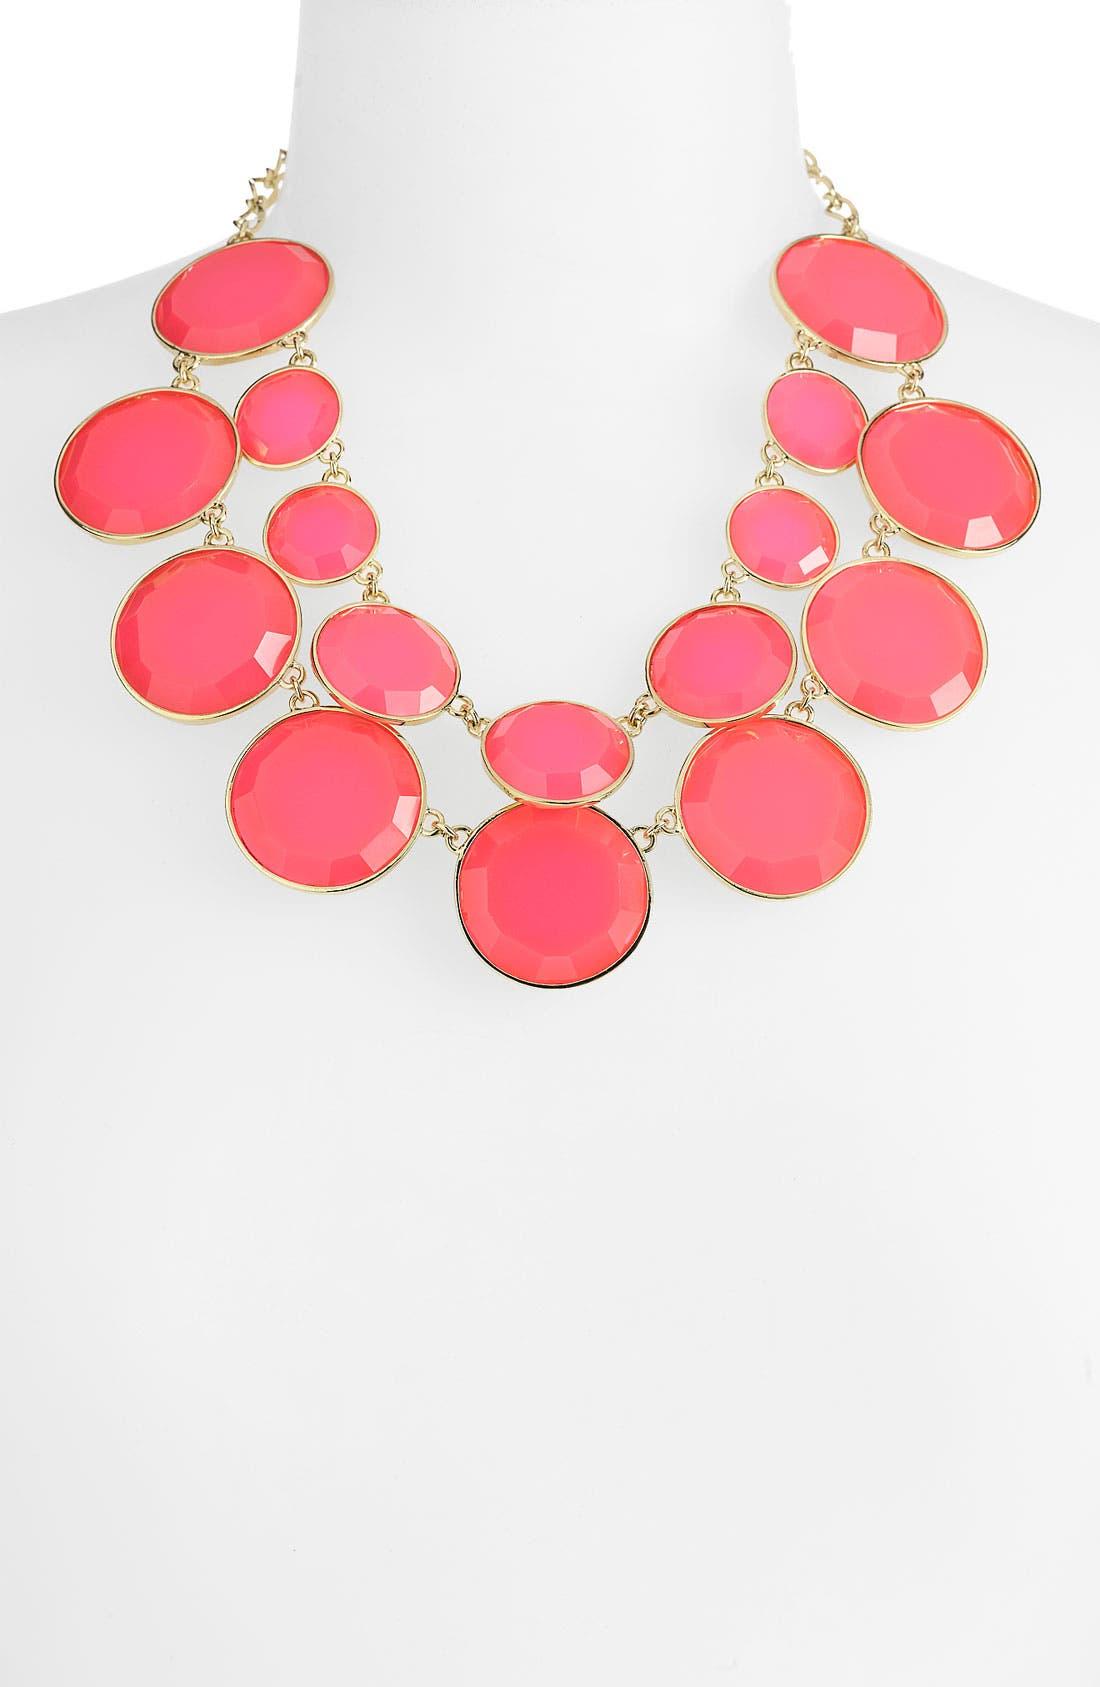 KATE SPADE NEW YORK, 'bauble box' double row bib necklace, Main thumbnail 1, color, 670